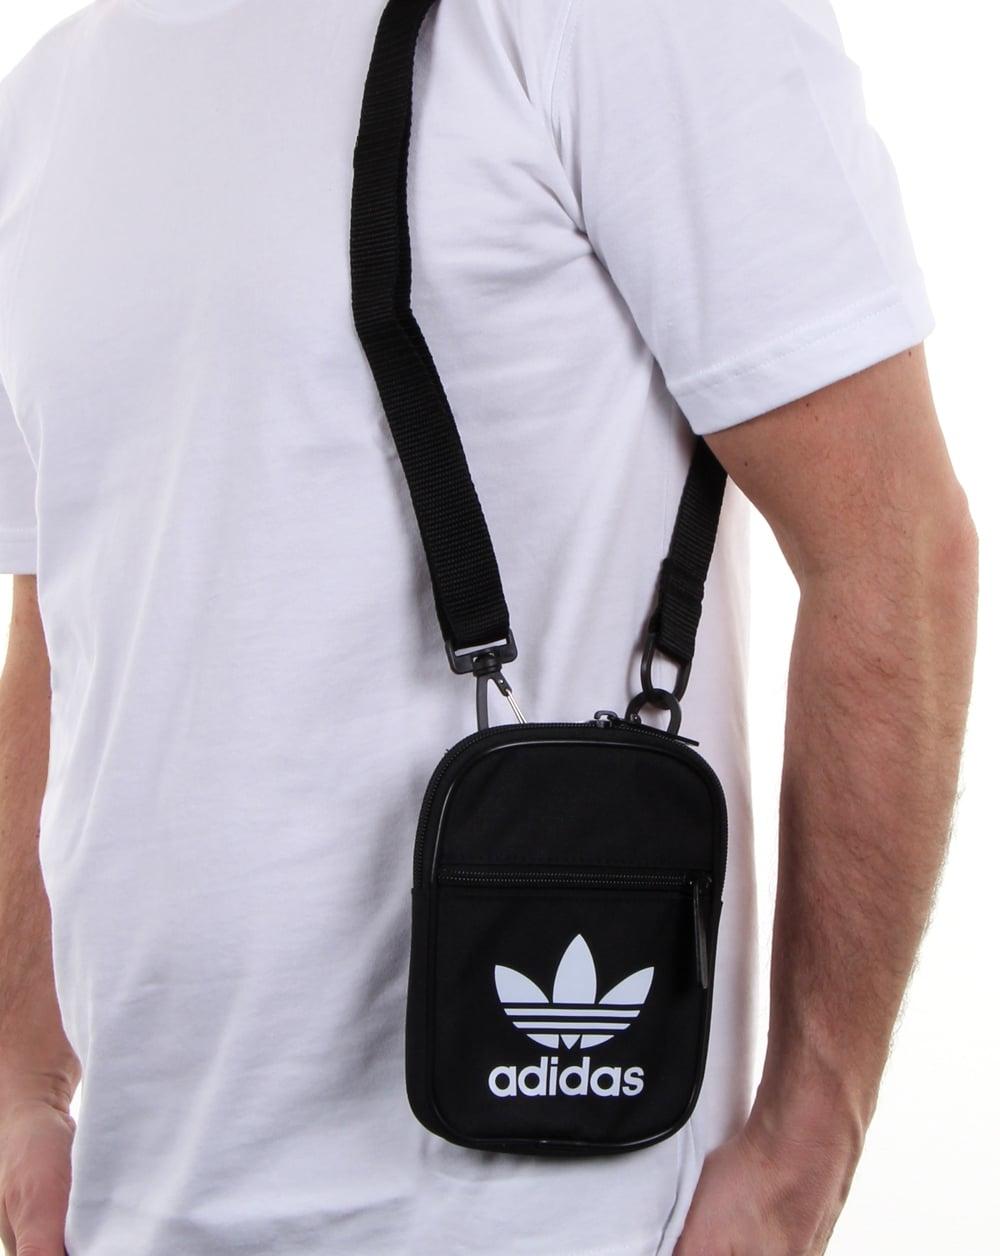 37057d686e3b Buy small adidas messenger bag   OFF68% Discounted